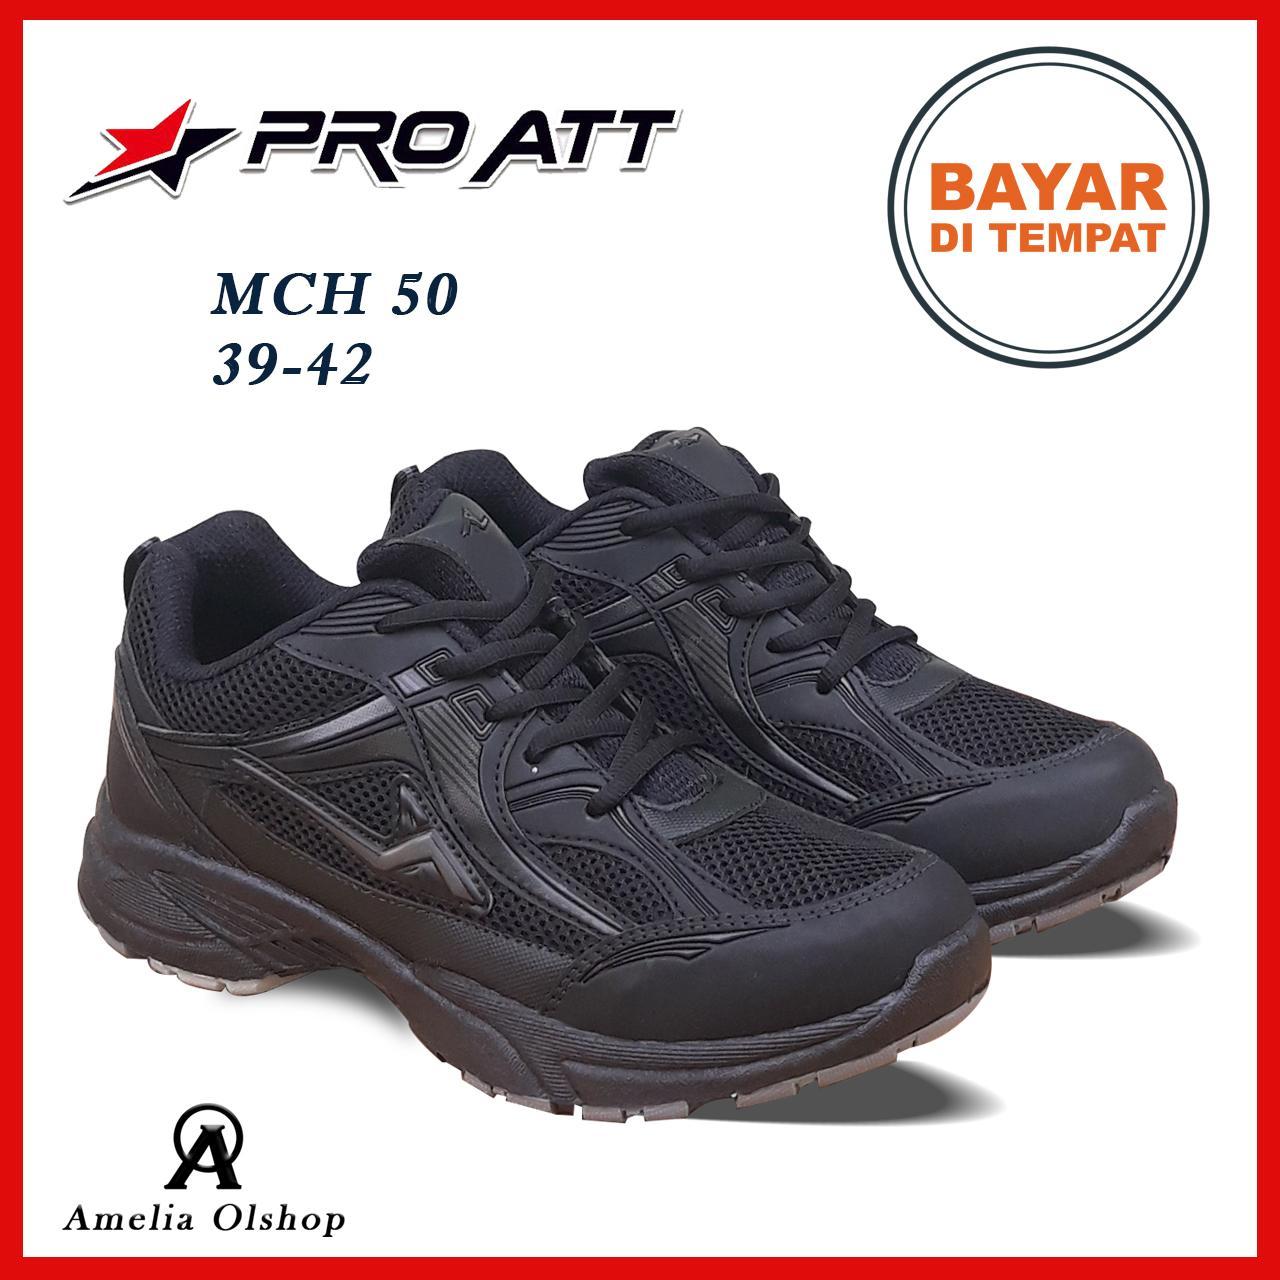 Amelia Olshop - Pro ATT Sepatu Sneaker Pria / Sepatu Pria / Sepatu Olahraga / Sepatu Sport / Sepatu Murah / Sepatu High Quality New Arrival - MCH 50 Hitam Polos